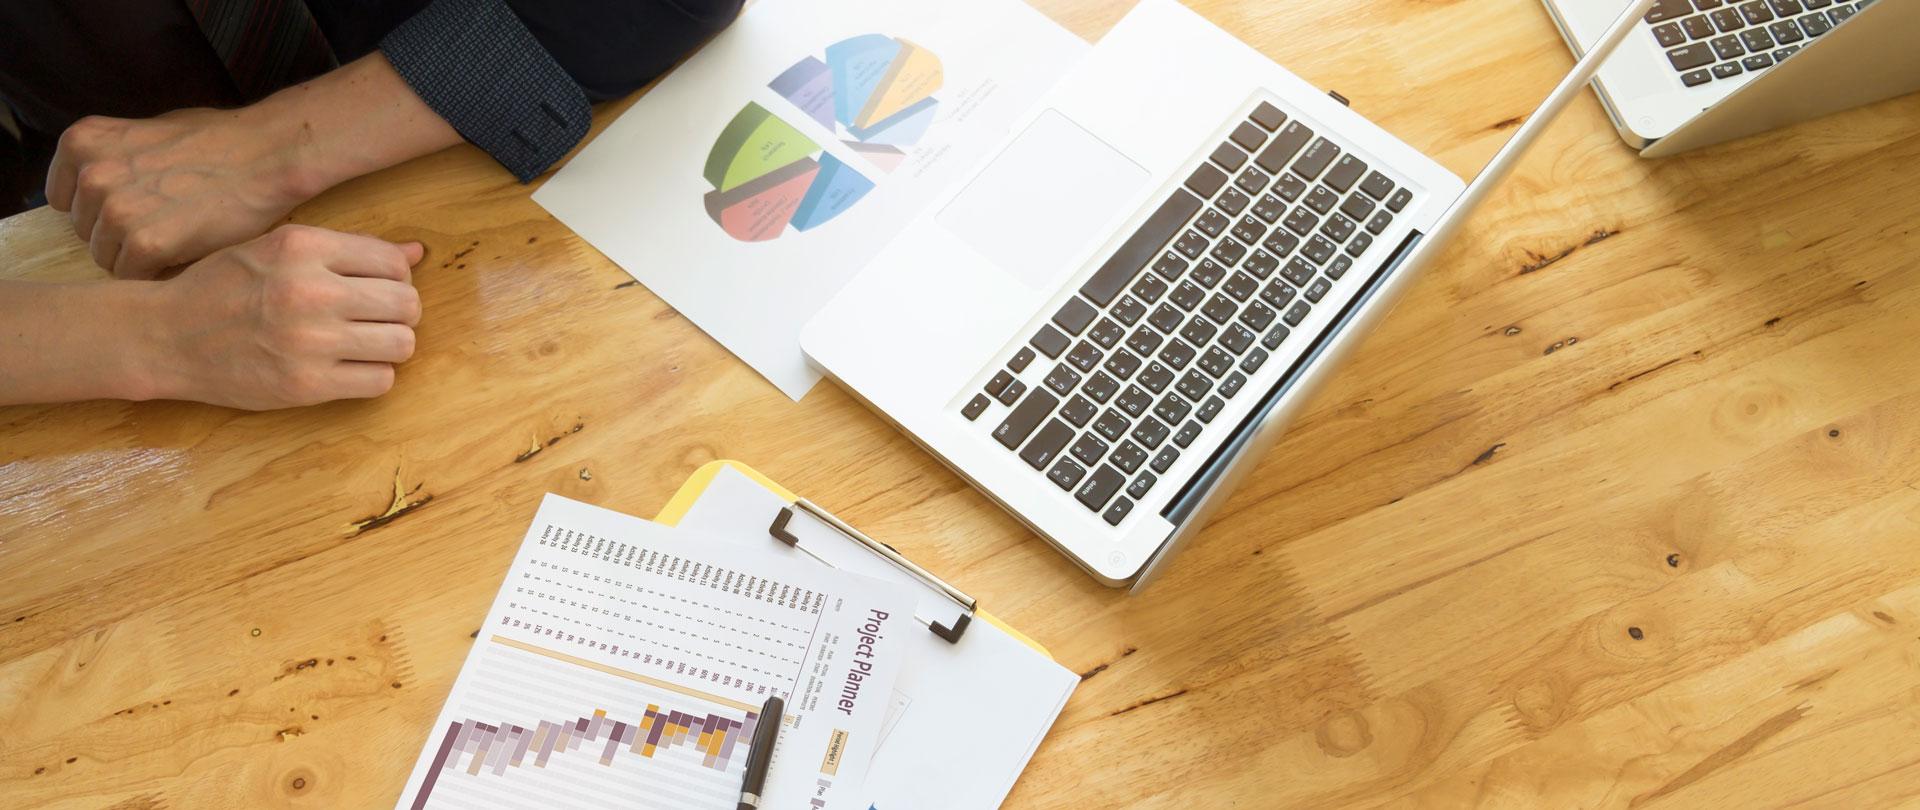 Mejora tu tarifa media y tu rentabilidad con las estrategias de revenue management